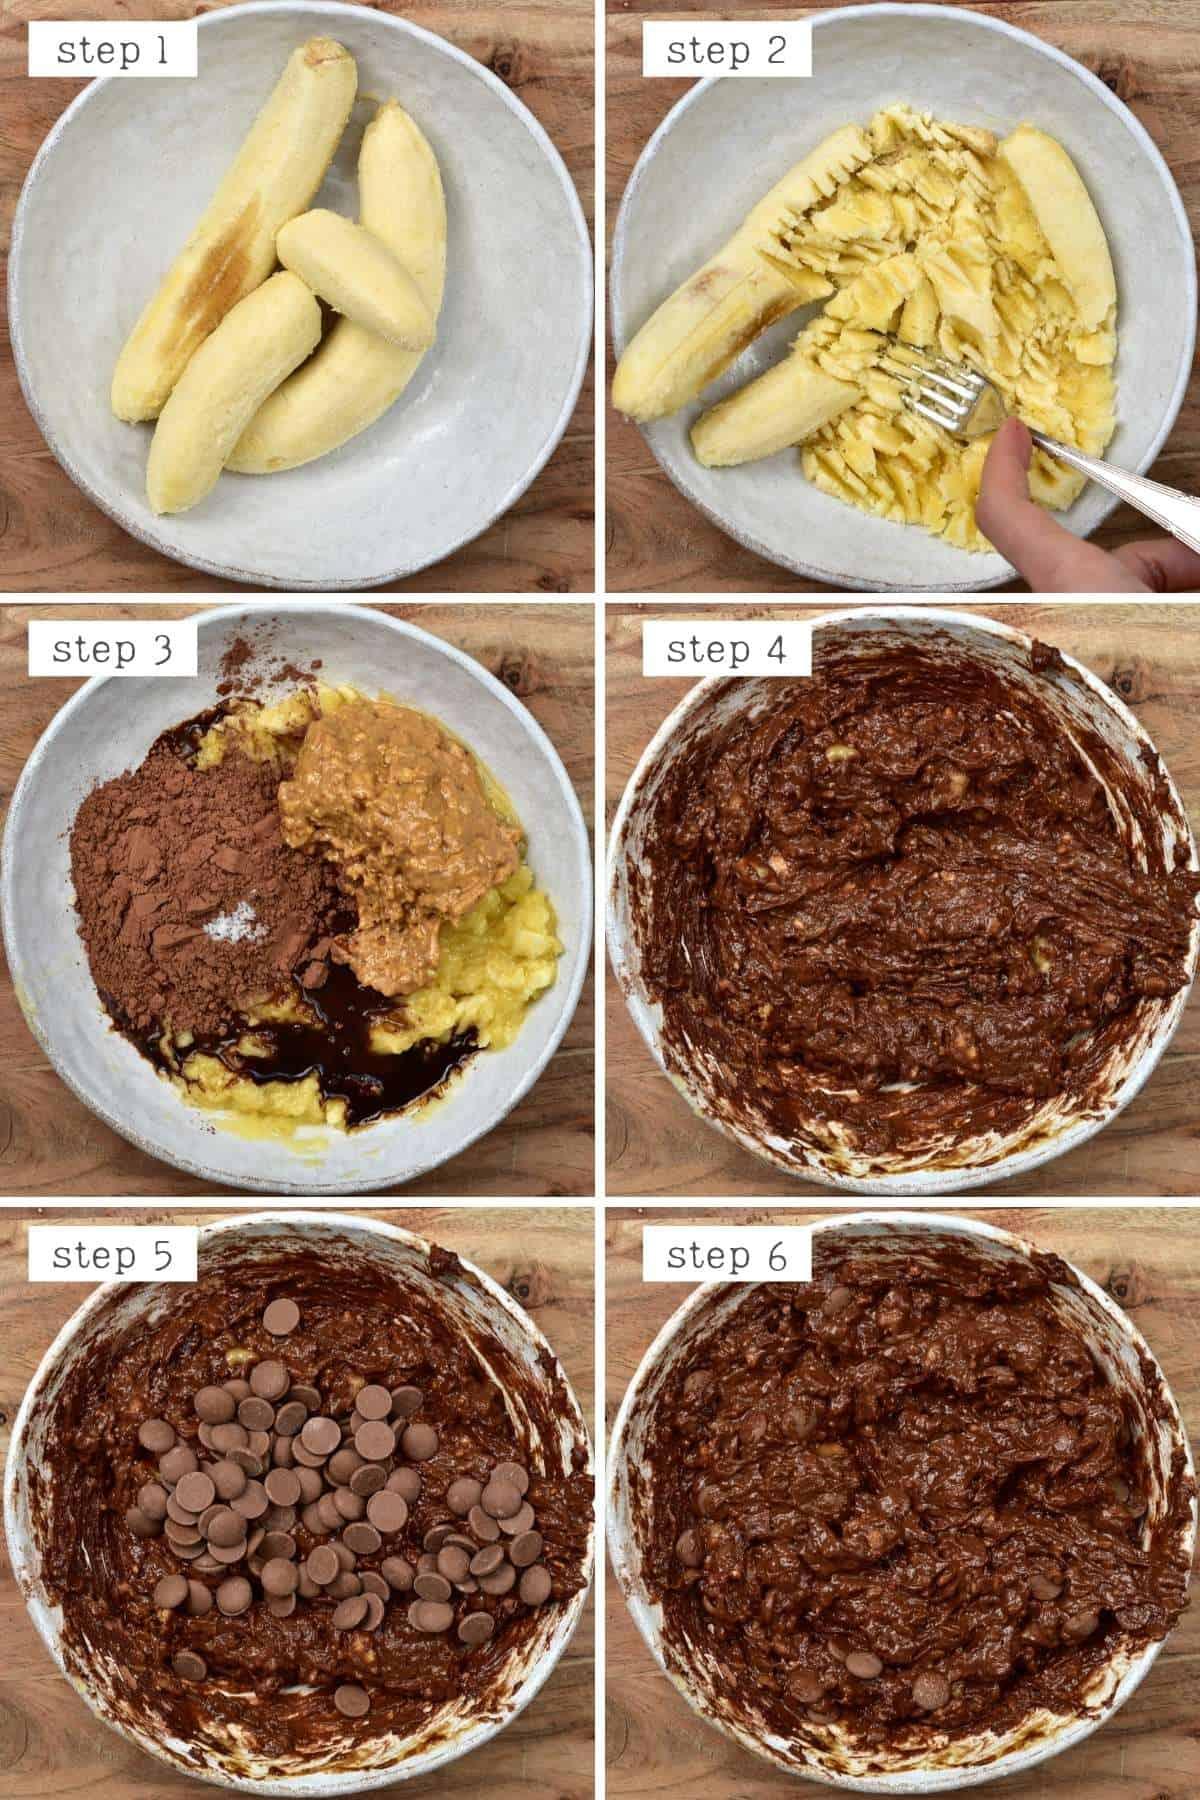 Steps for making banana brownies